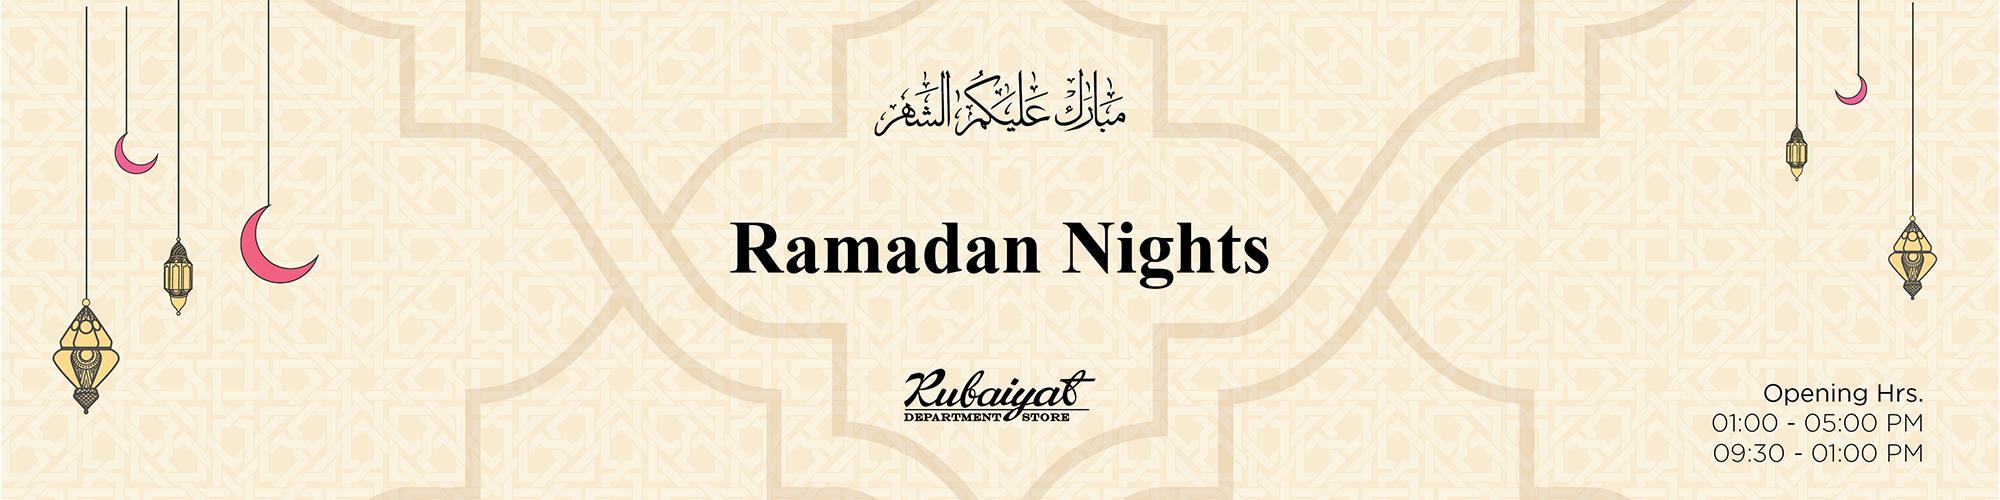 Ramadan-Night-Web-Banner1